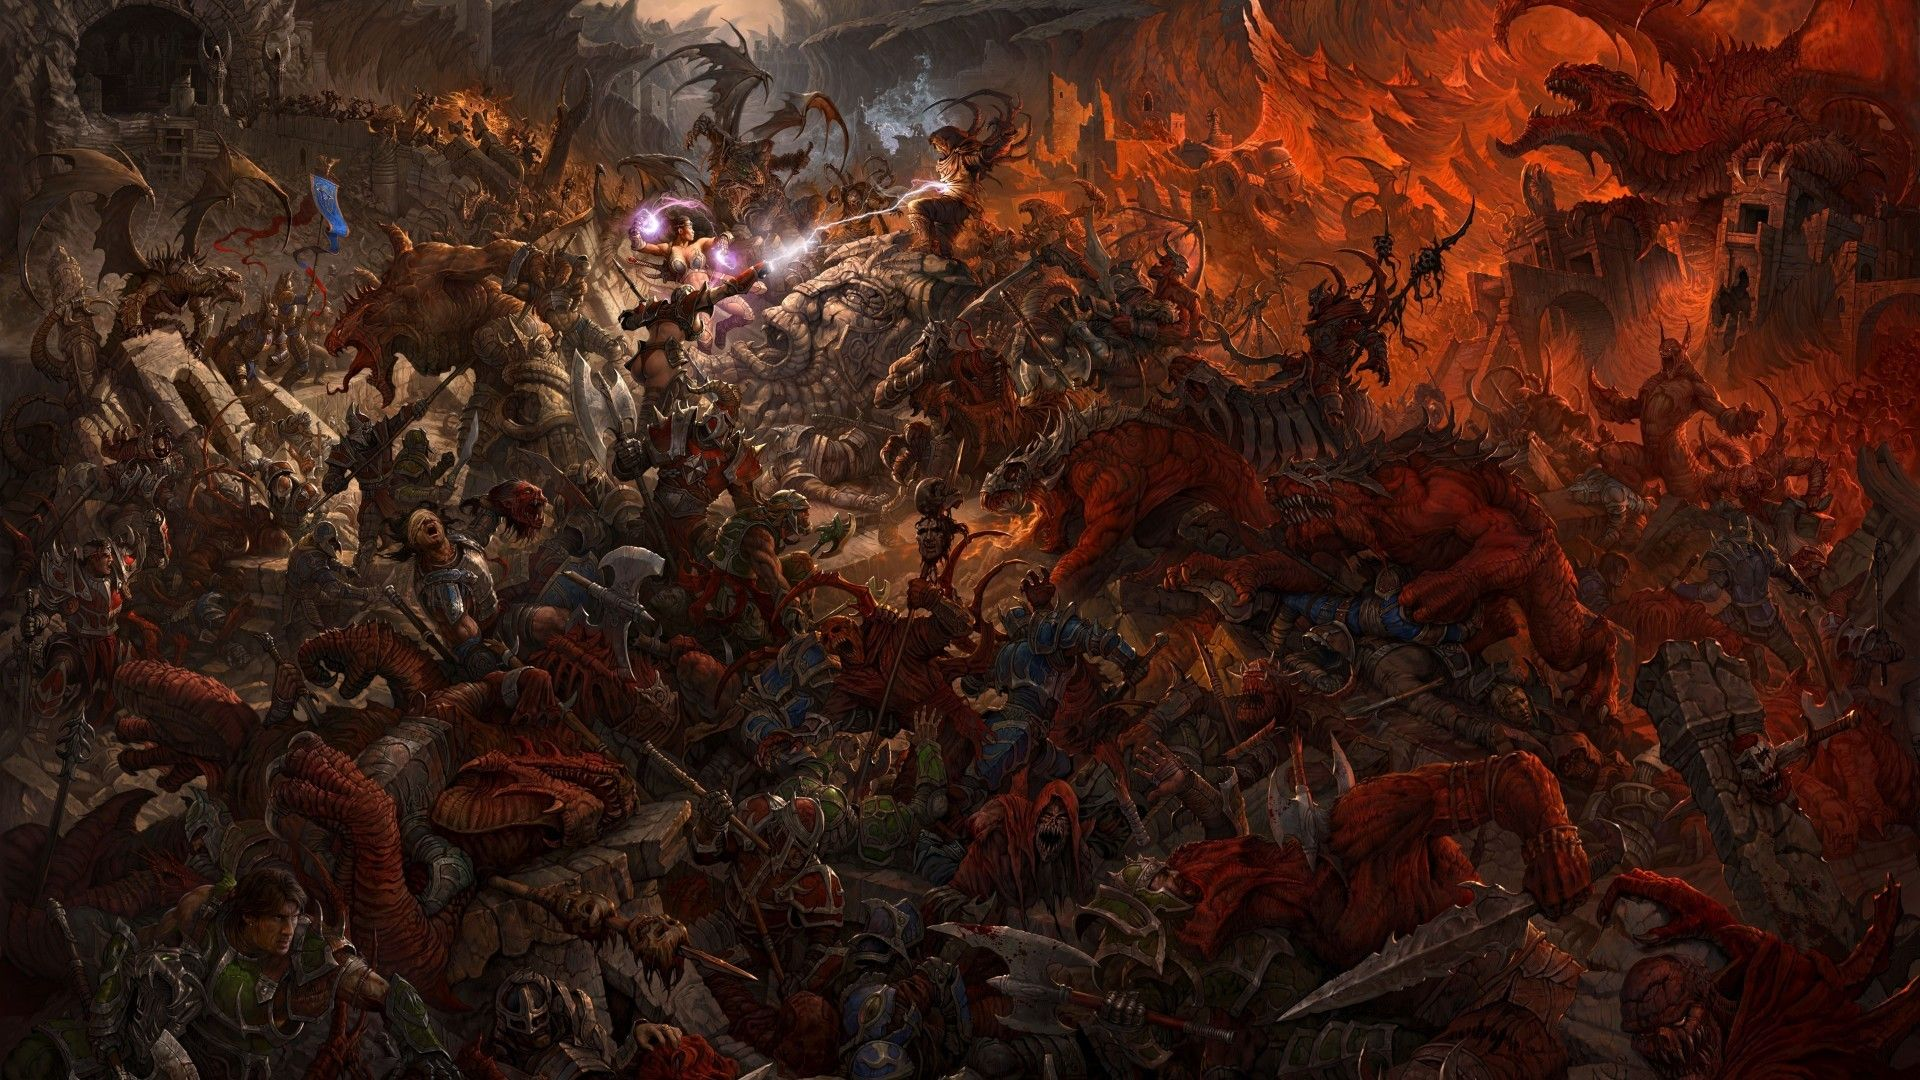 Warhammer War Battles Wallpaper 24445 Wallhaven Cc Fantasy P